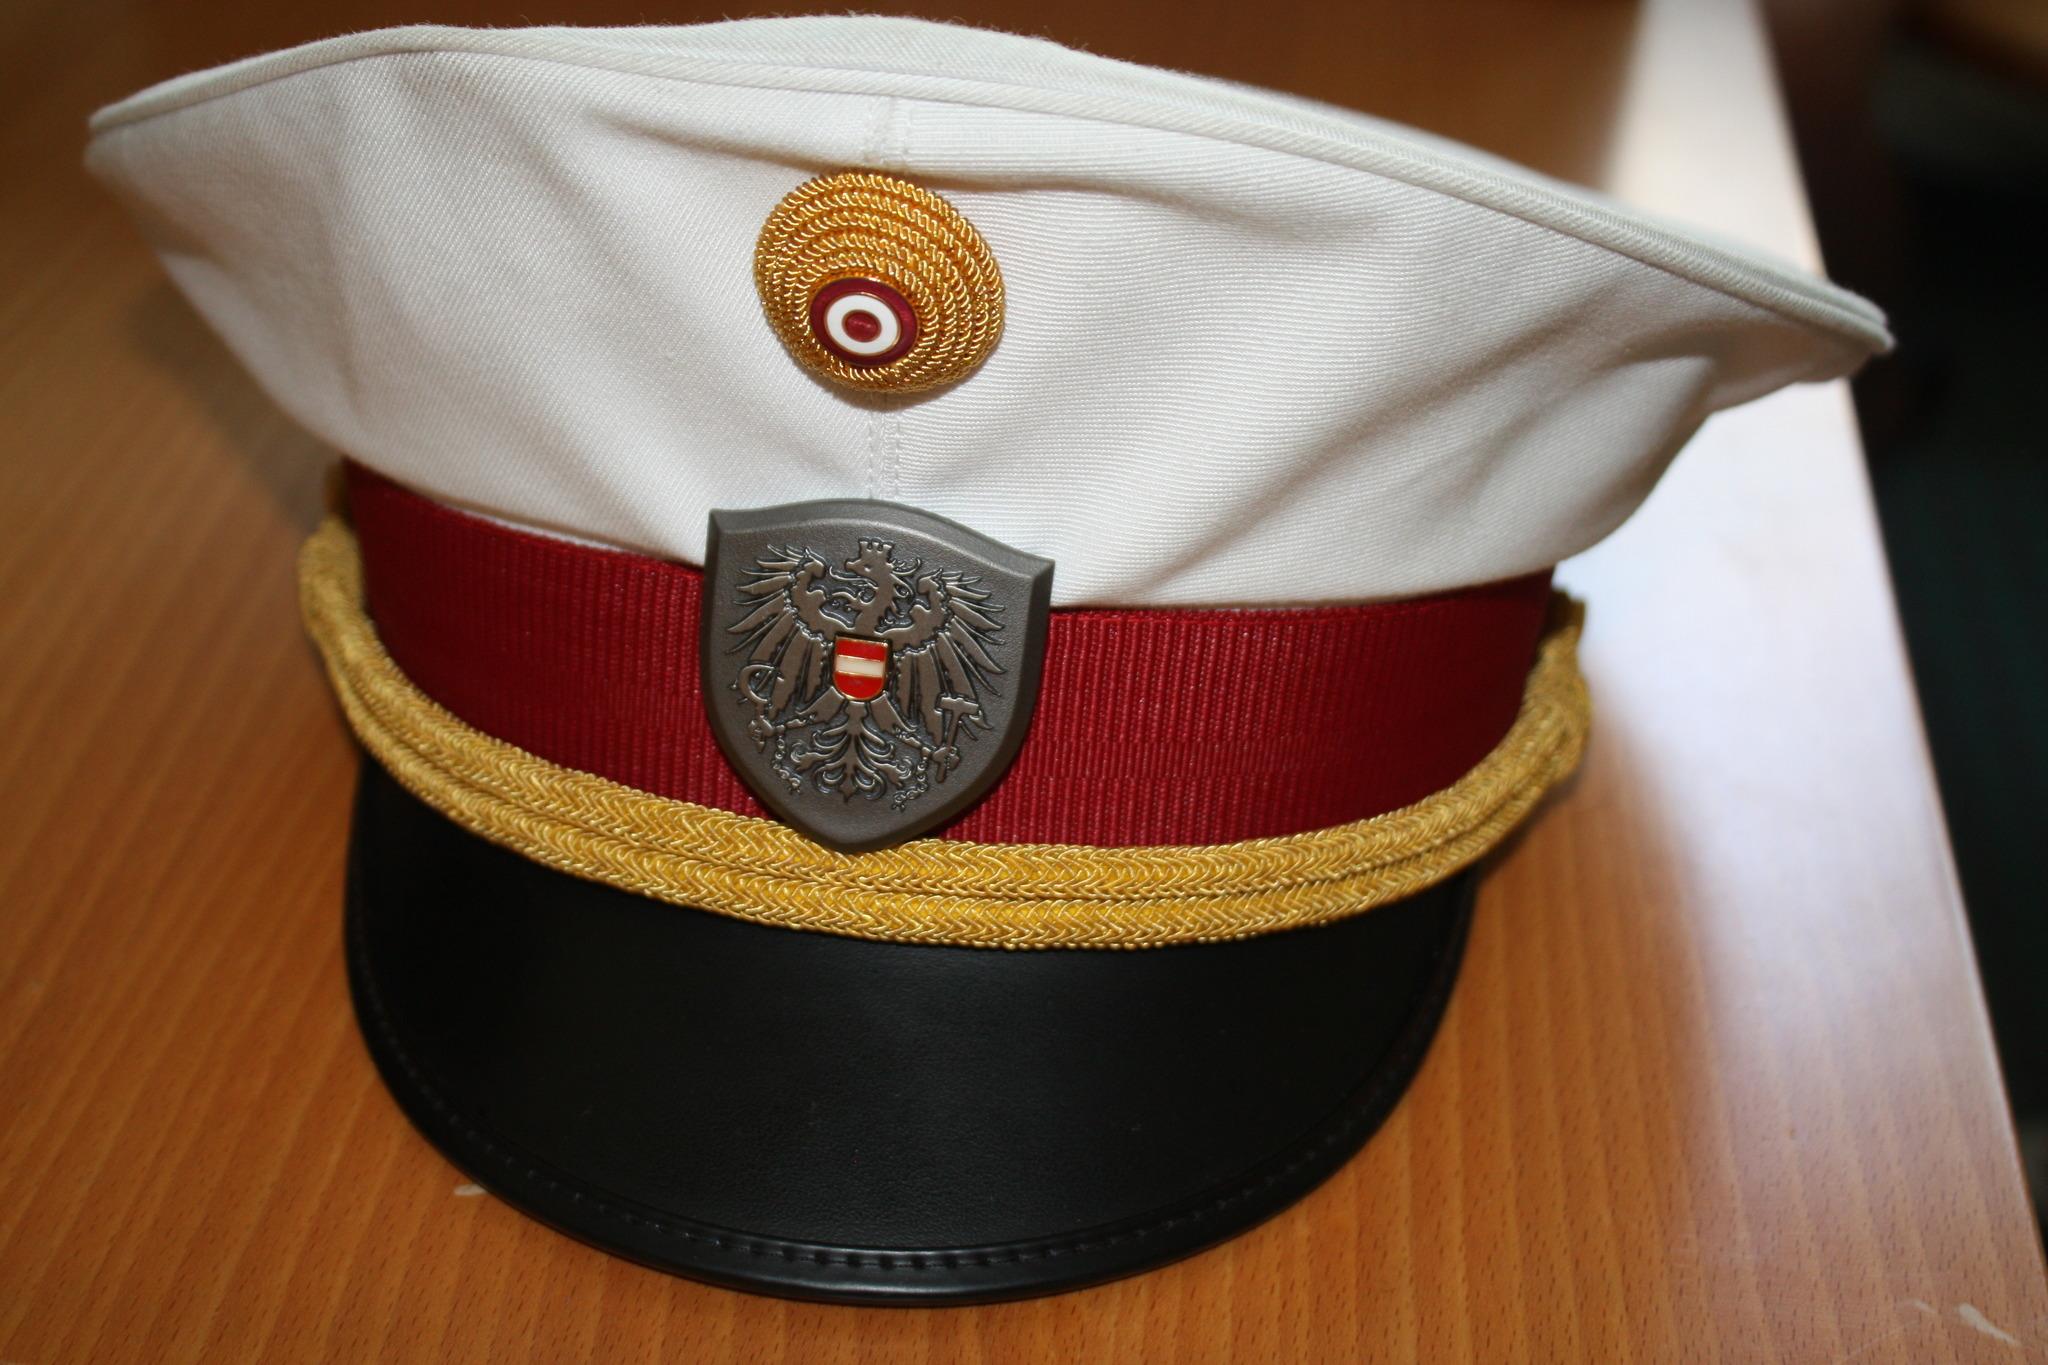 Kindersommer Schrems - Polizei - Gmnd - huggology.com